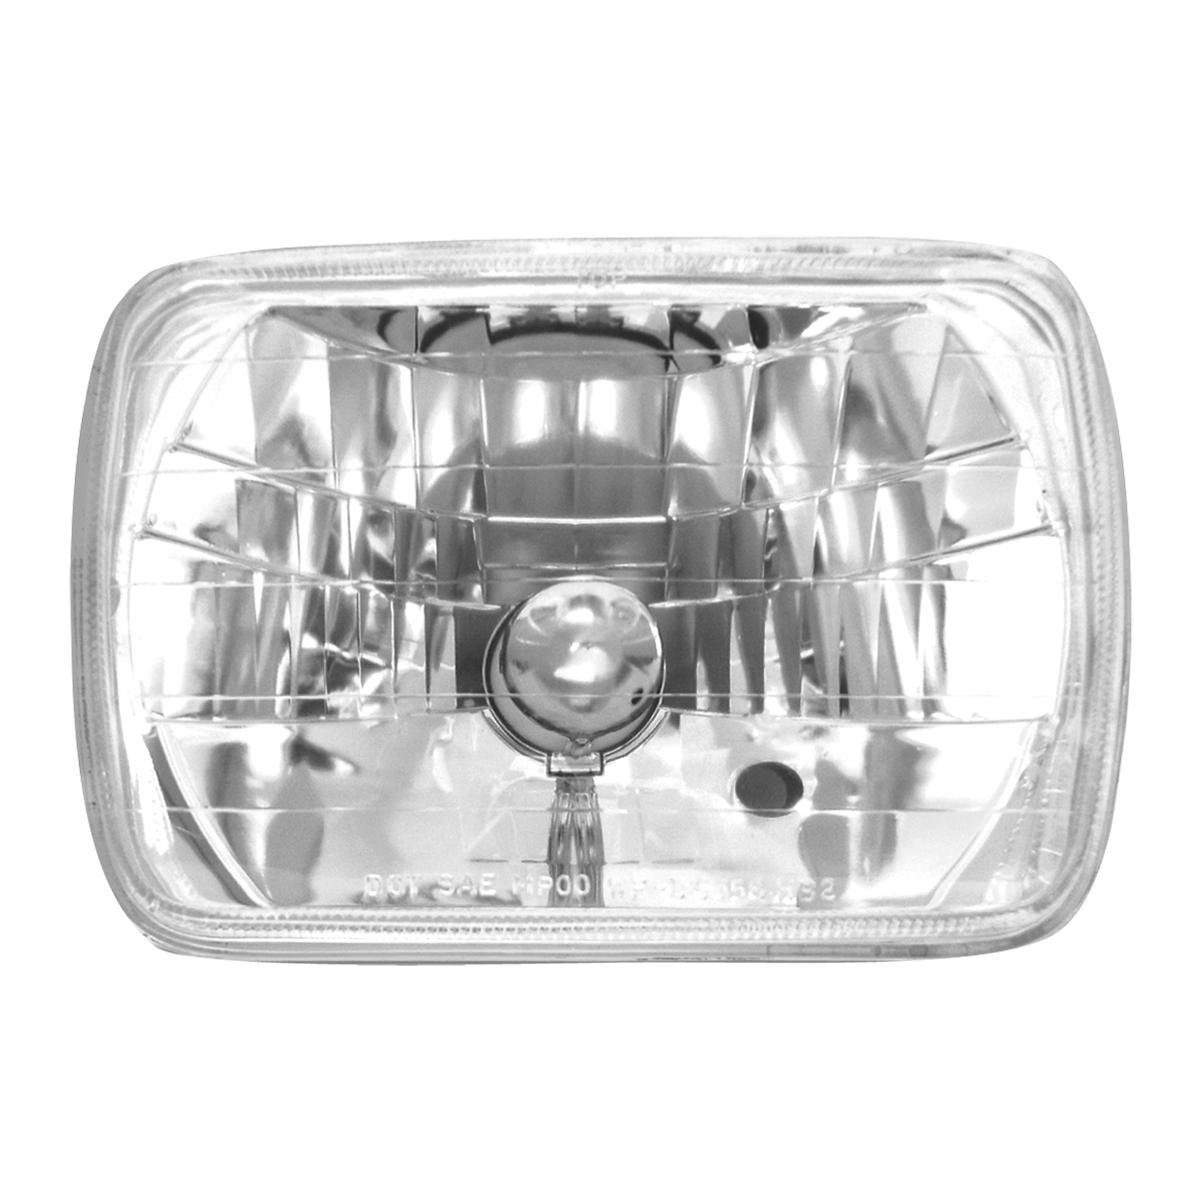 "#77390 (7.875"" x 5.6"") Rectangular Headlamp with #H4 Halogen Bulb"